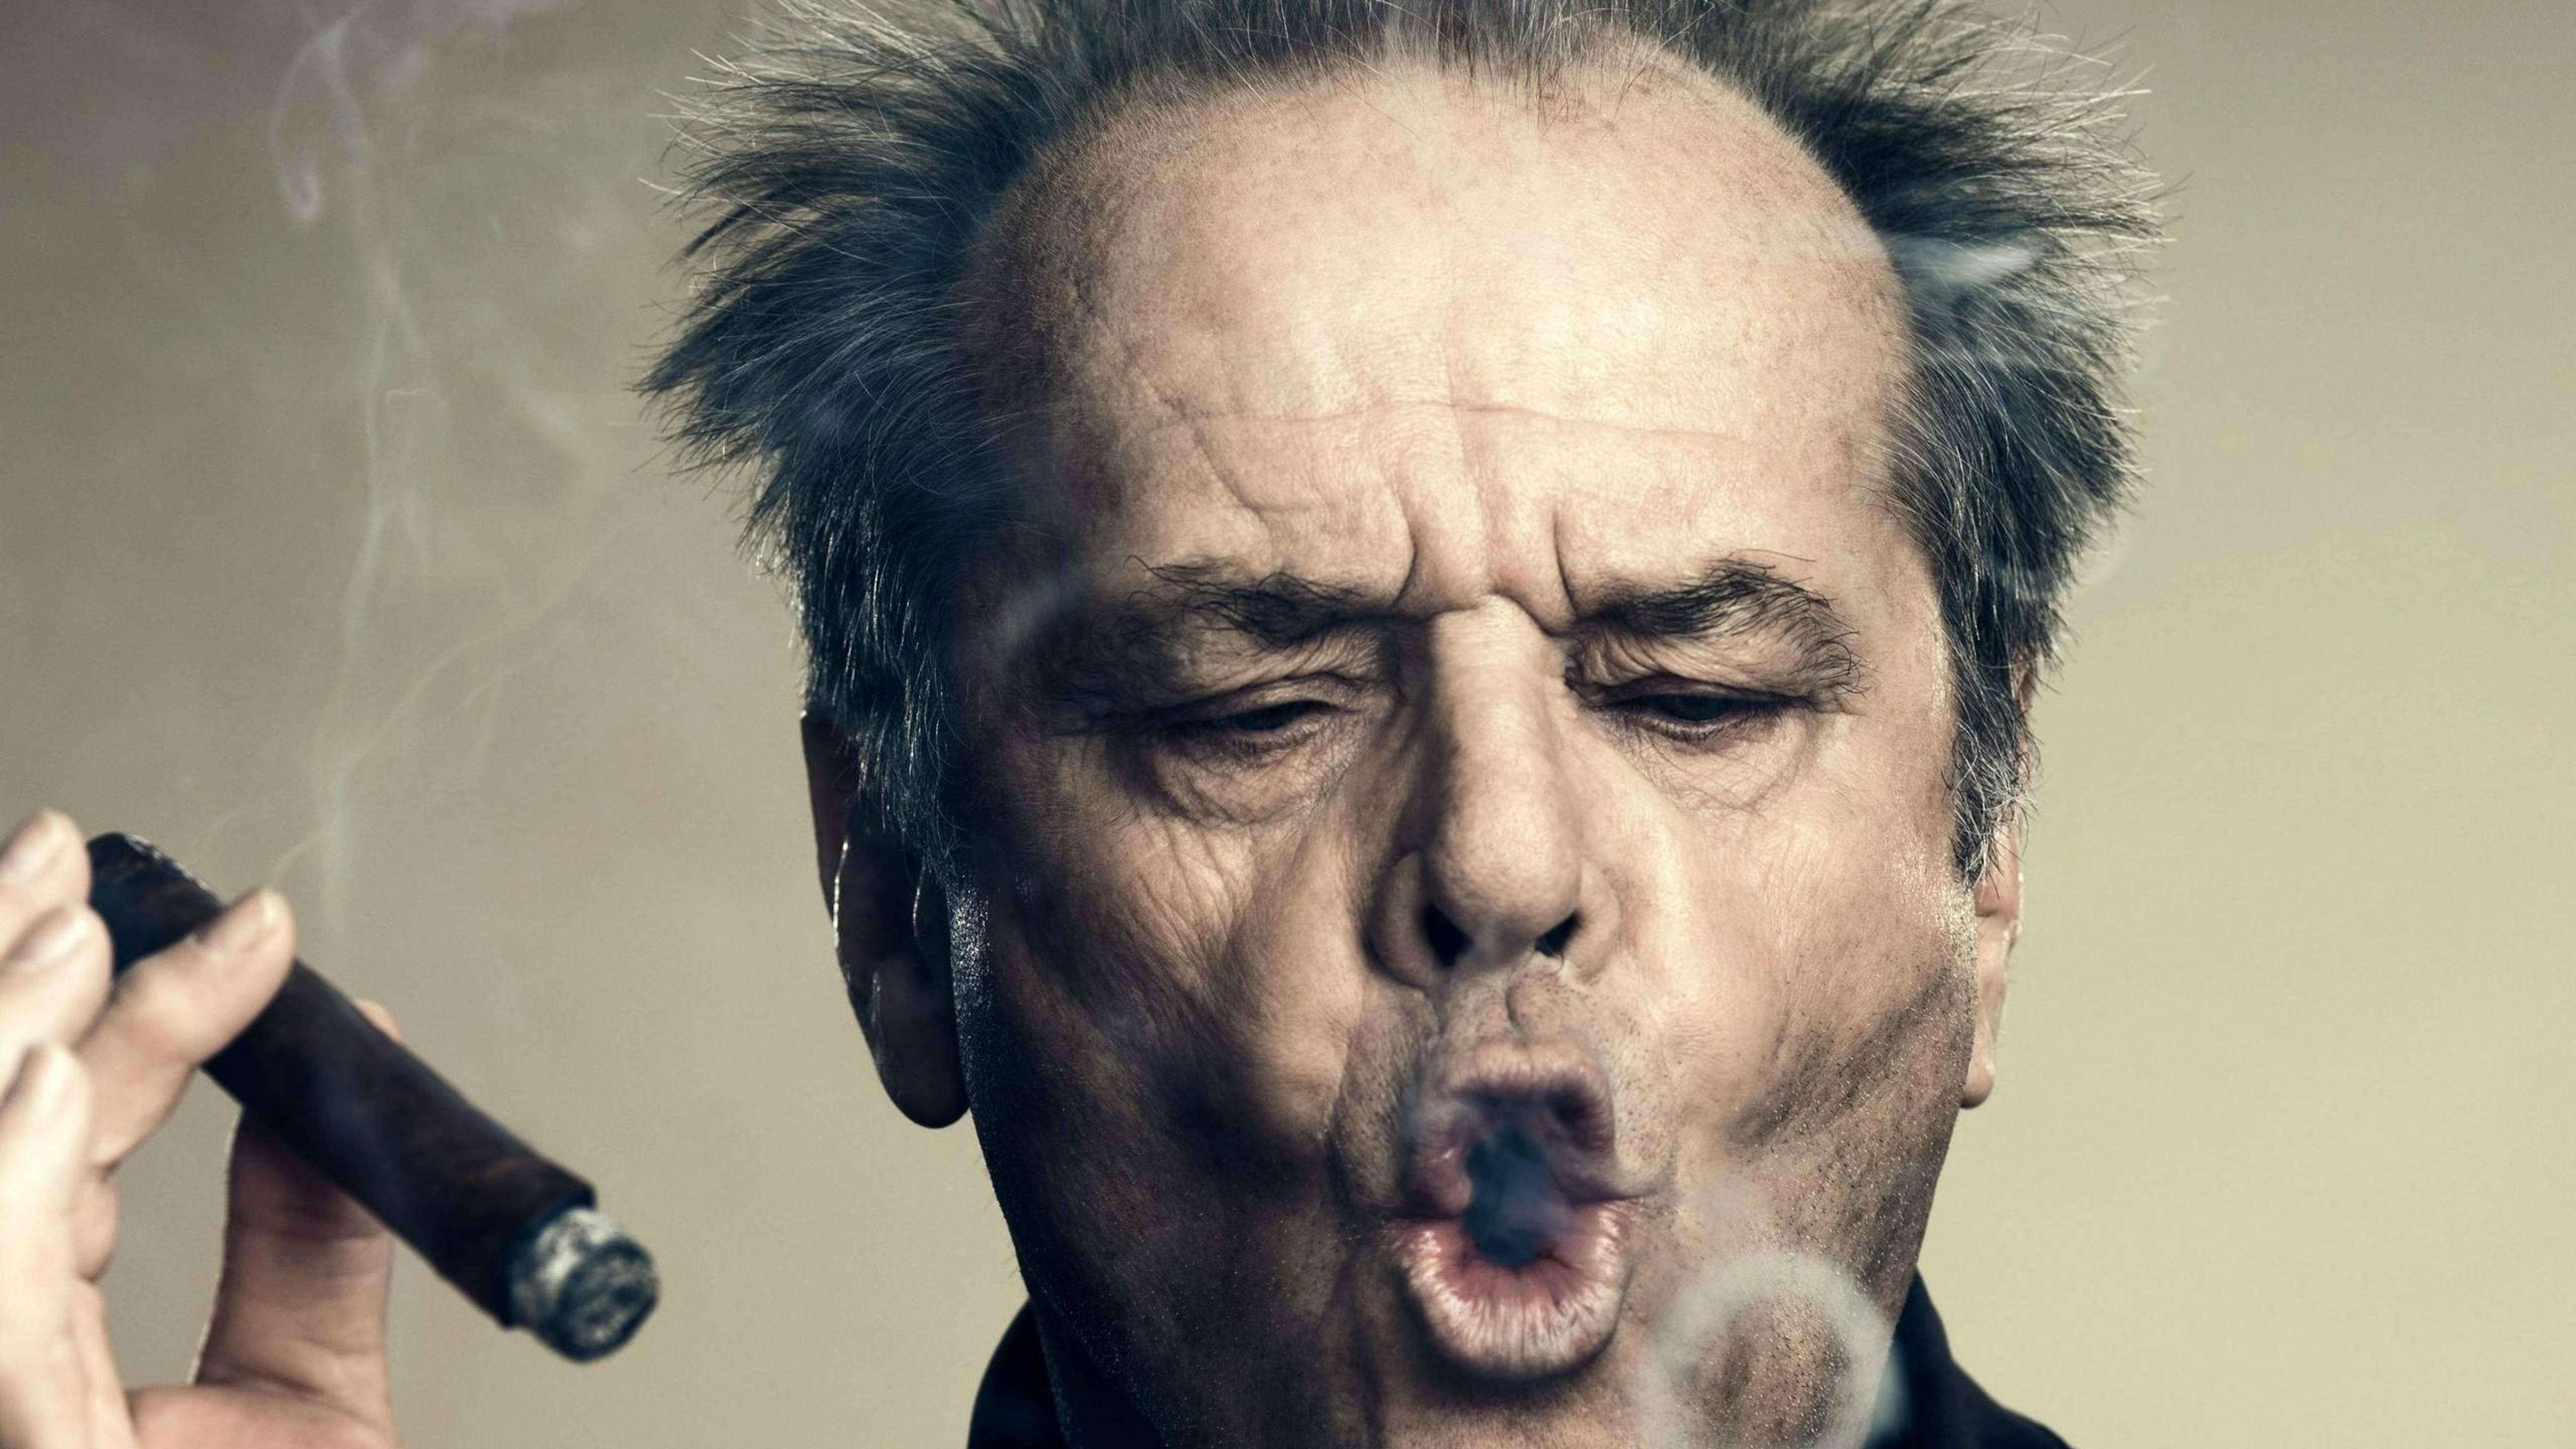 Jack Nicholson Smoking Cigar Wallpaper Download 5120x2880